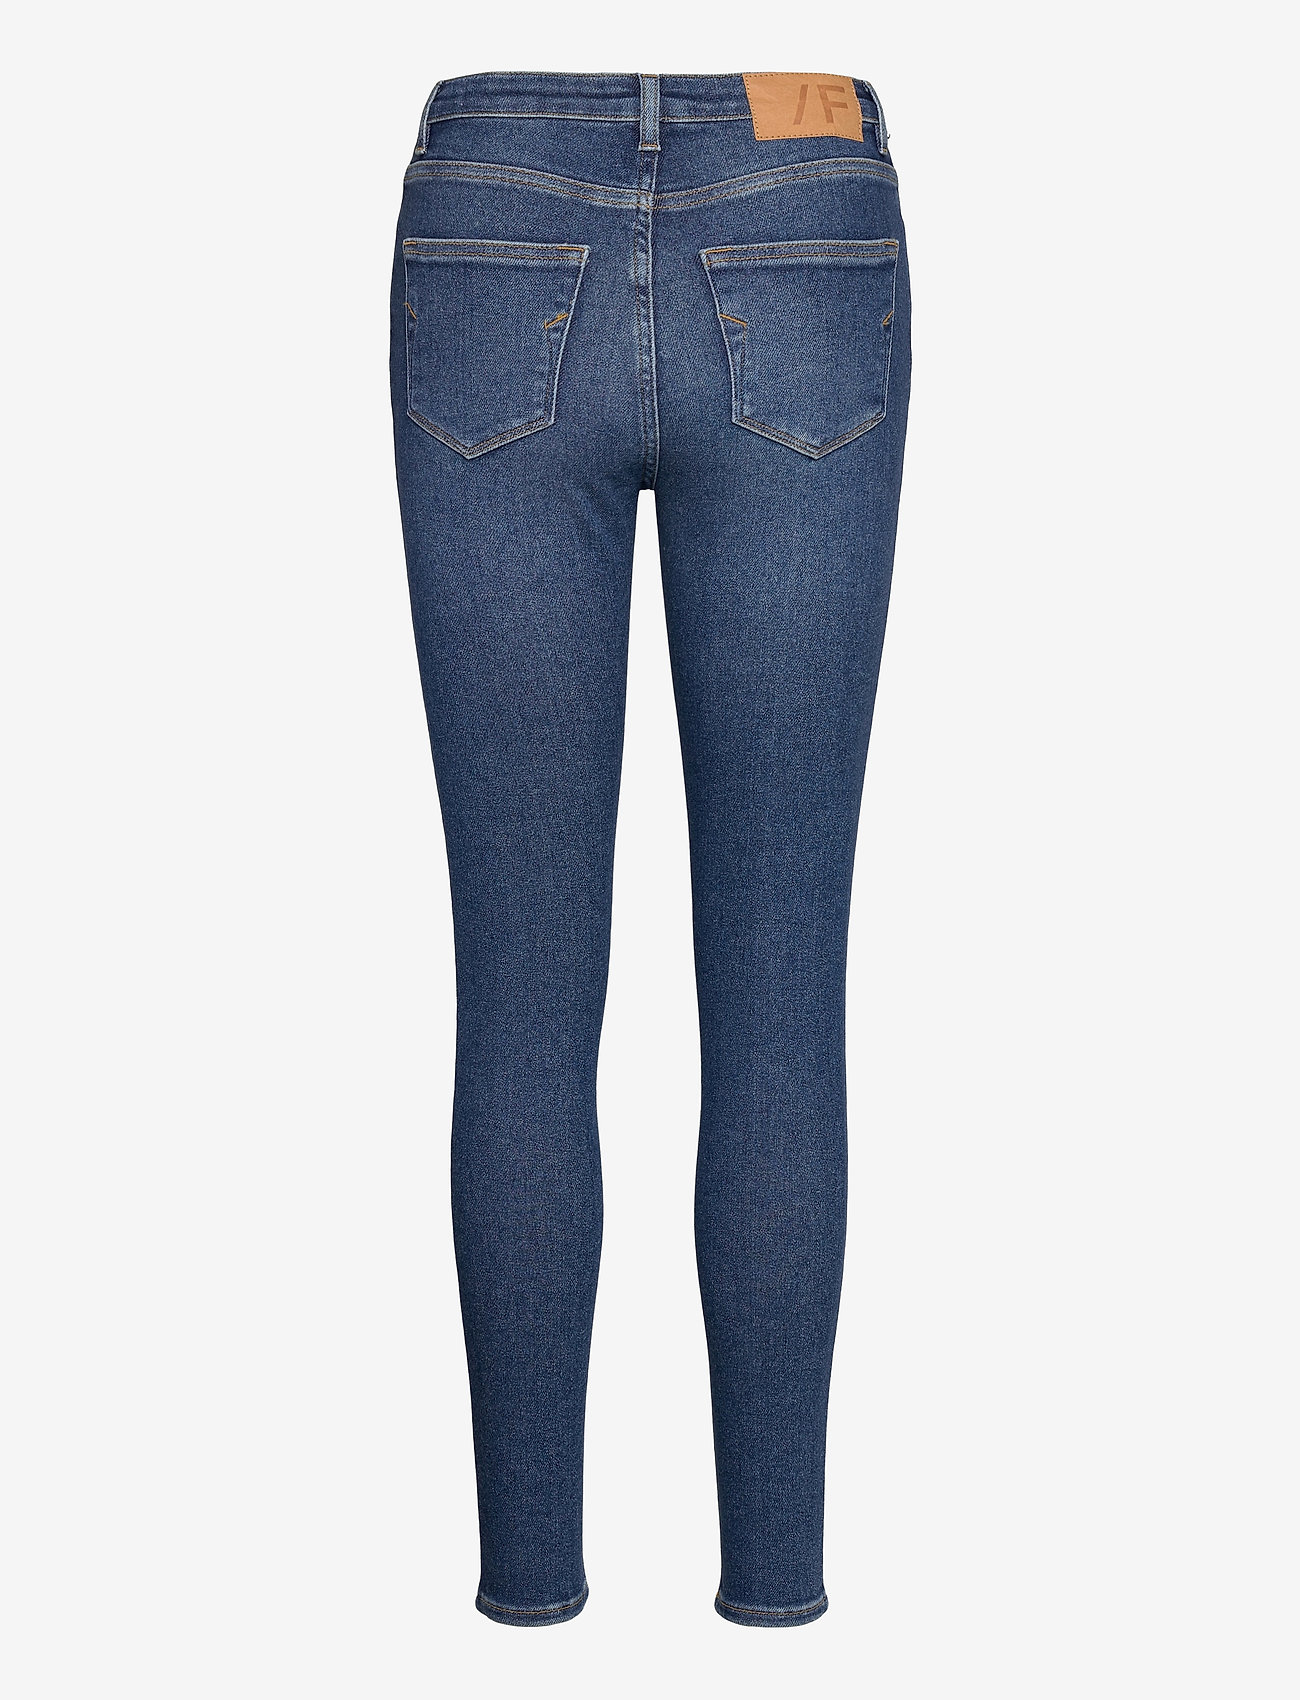 Selected Femme - SLFSOPHIA MW SKINNY DARK BLU JEAN U - skinny jeans - dark blue denim - 1